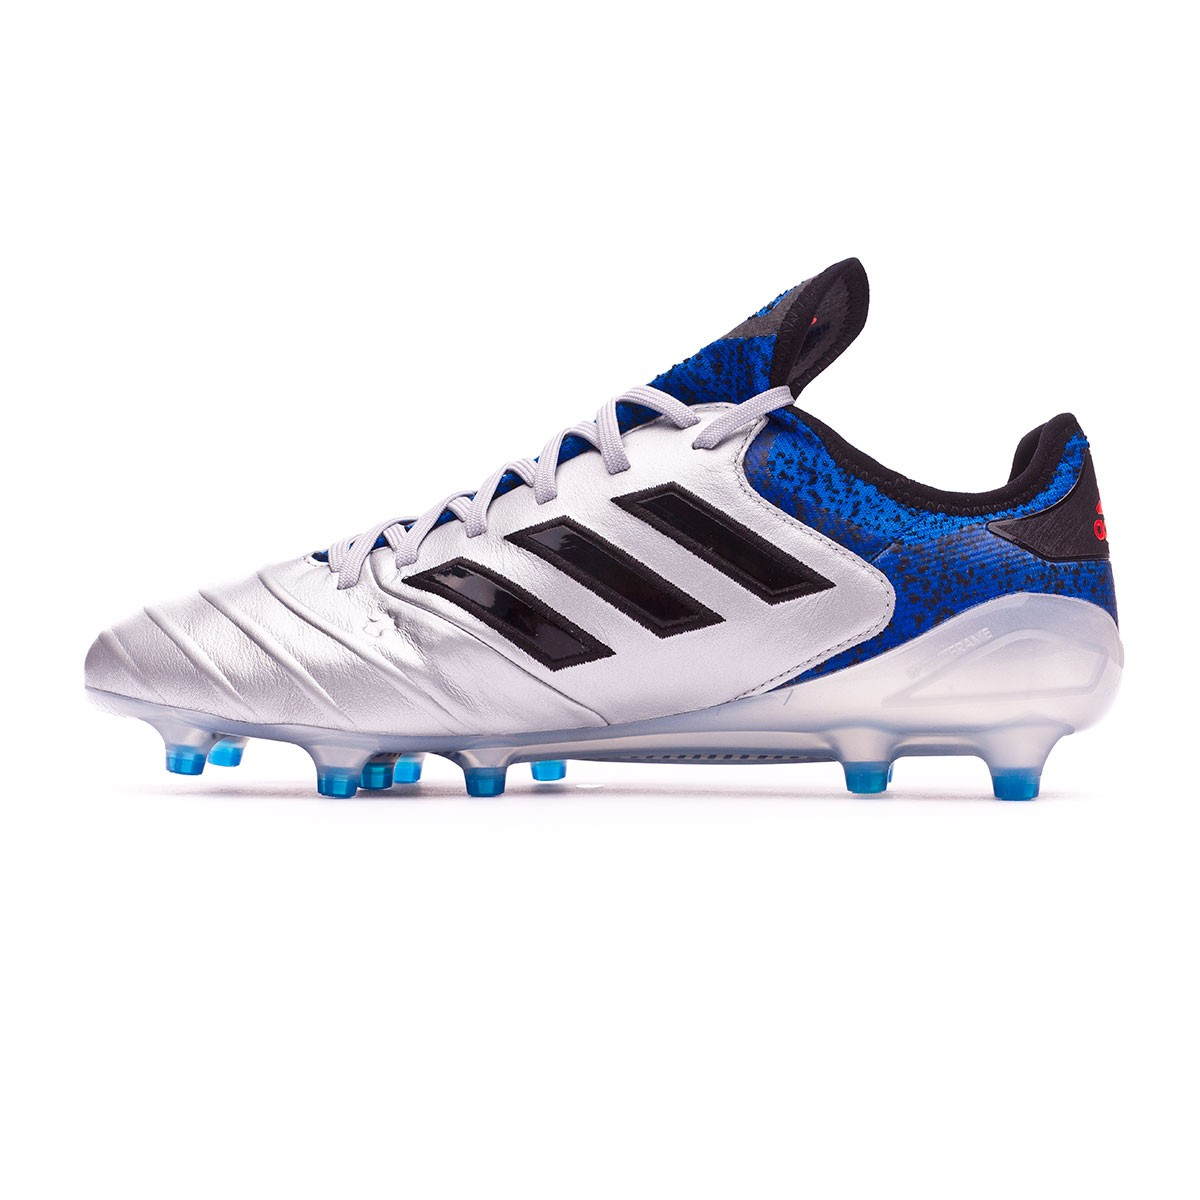 newest abc58 ac22e Boot adidas Copa 18.1 FG Silver metallic-Core black-Football blue - Football  store Fútbol Emotion